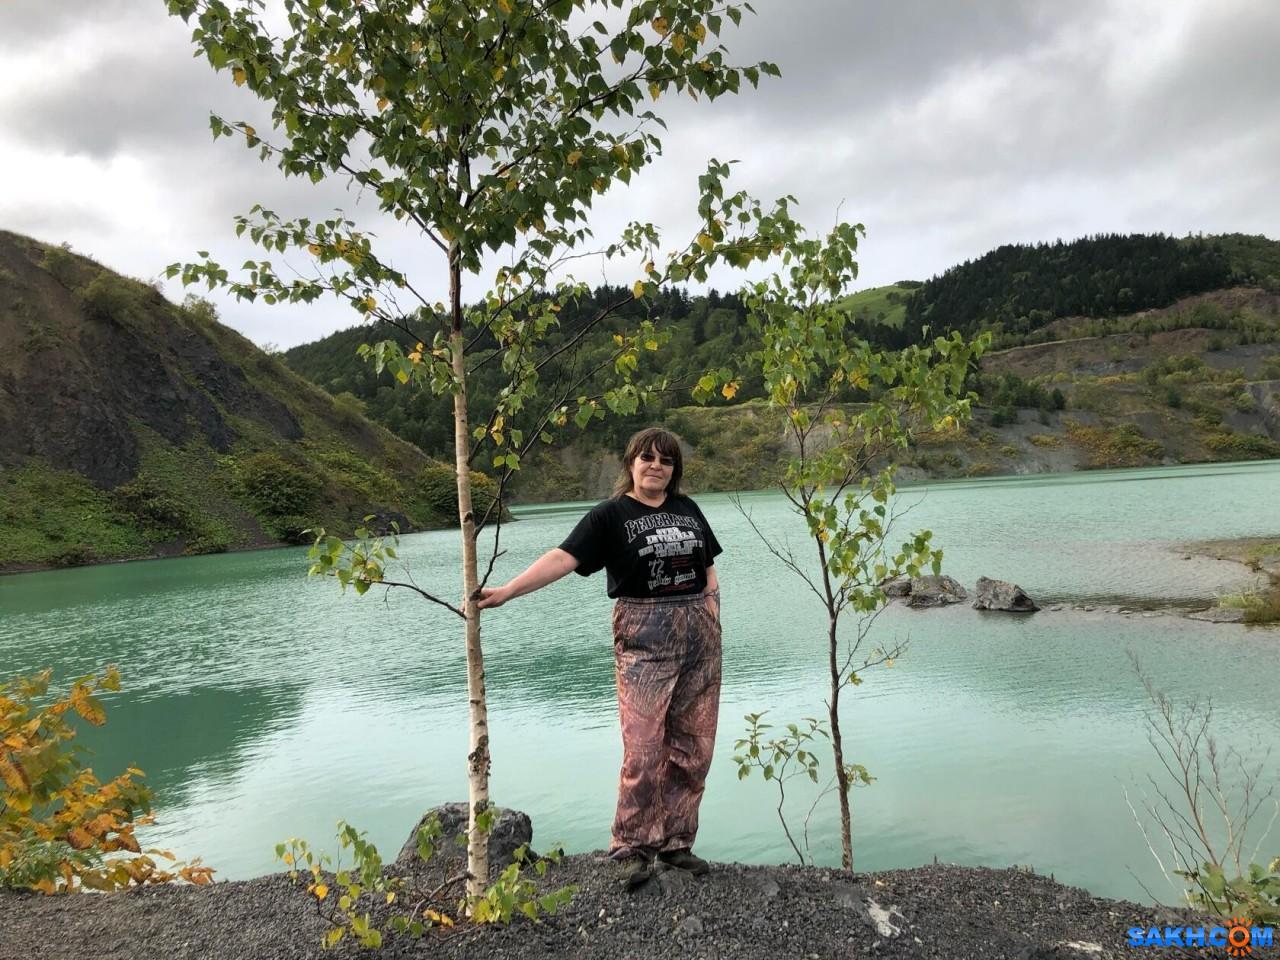 tasya: Возле Бирюзового озера.